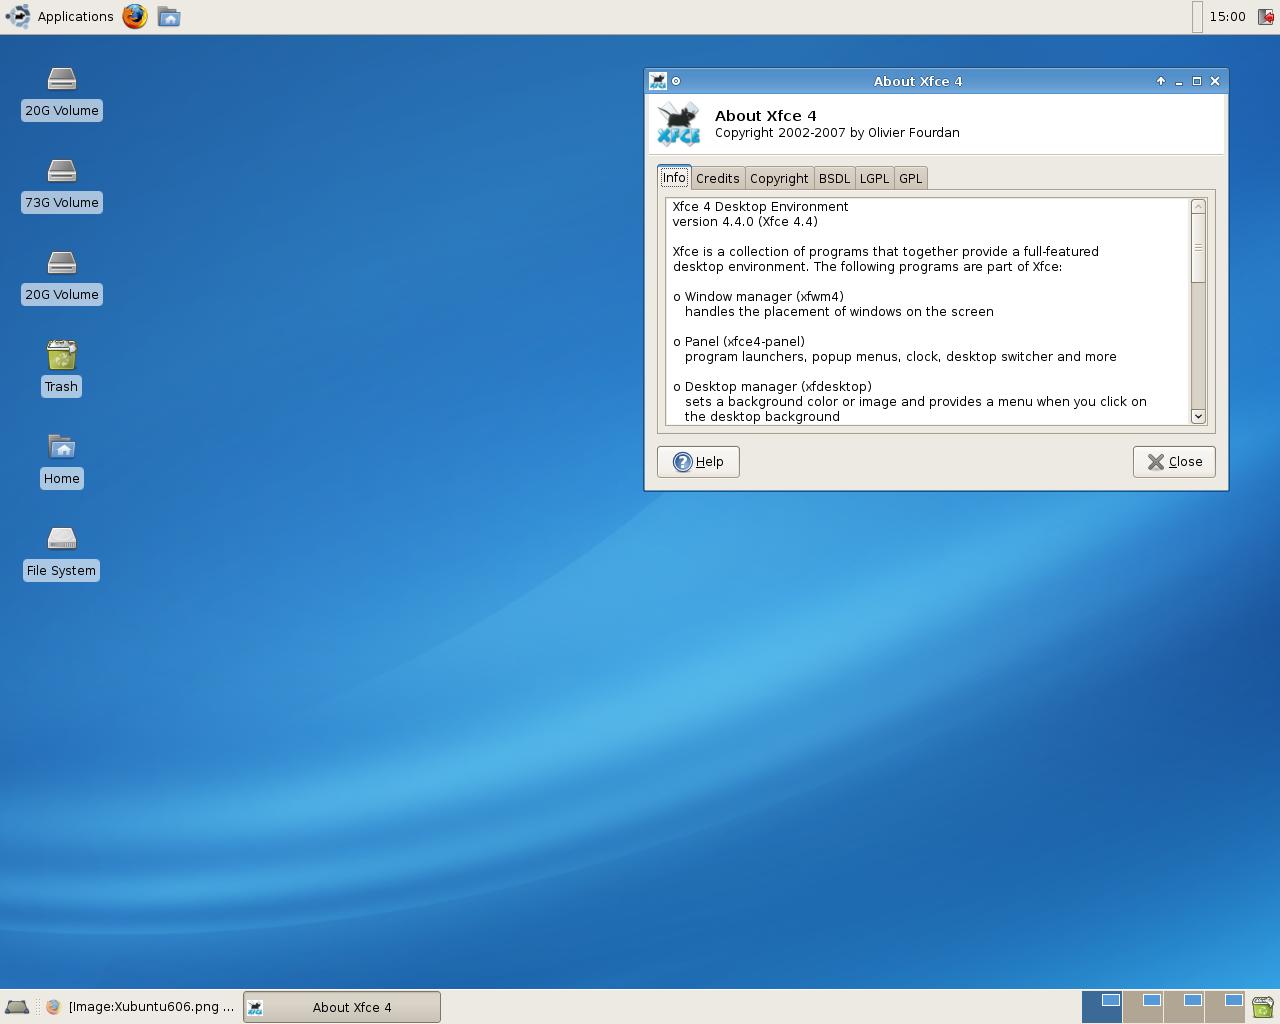 http://upload.wikimedia.org/wikipedia/commons/b/bb/Xubuntu704.png